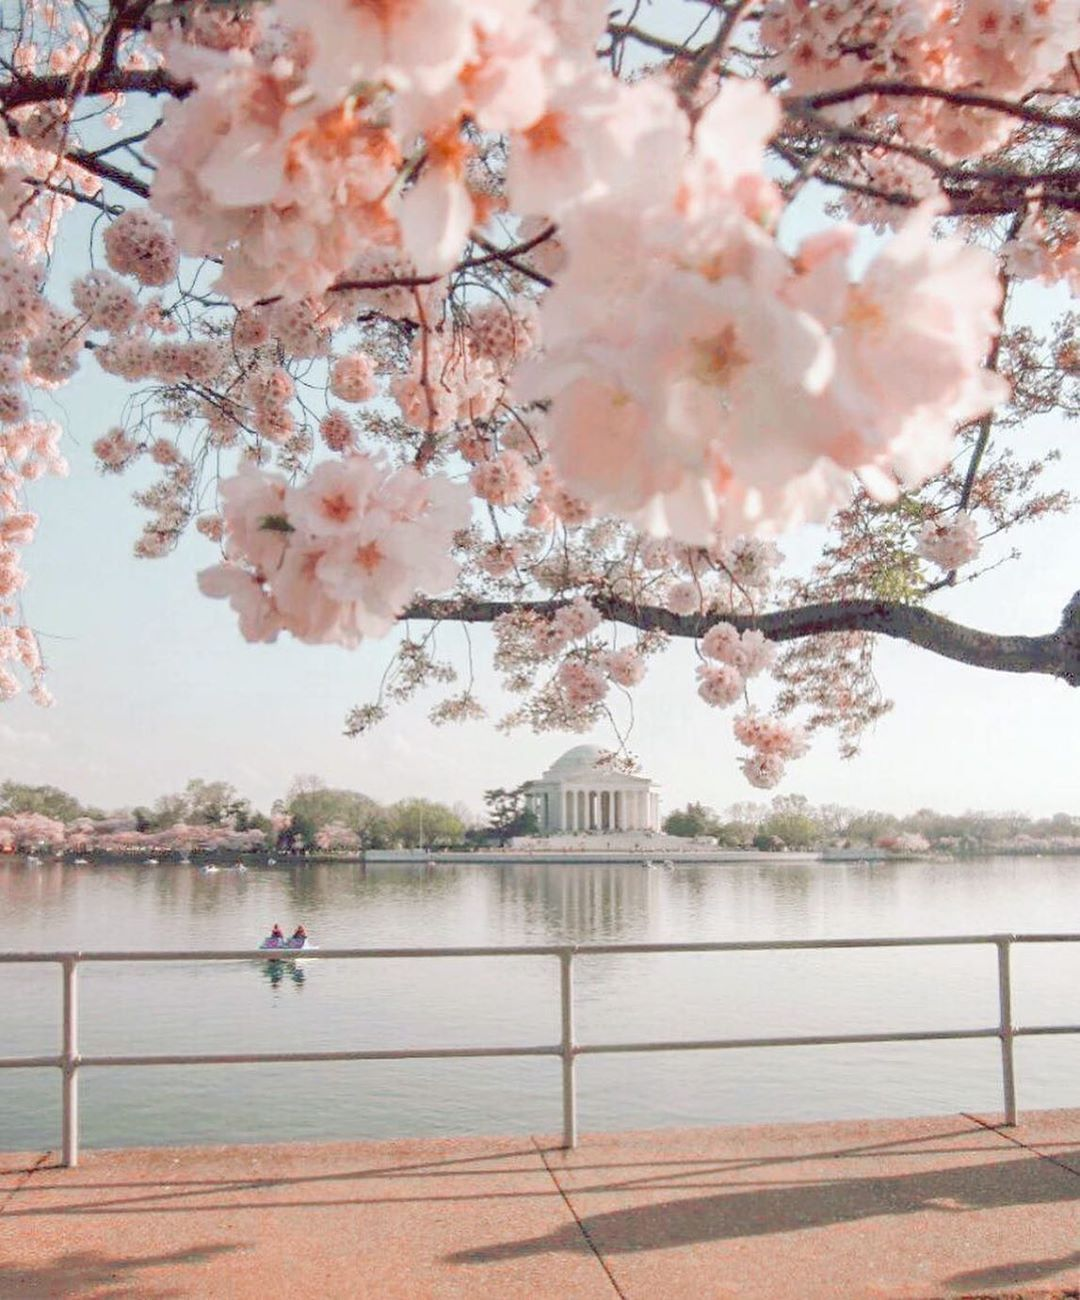 National Cherry Blossom Festival Usa Cherry Blossom Festival Blossom Cherry Blossom